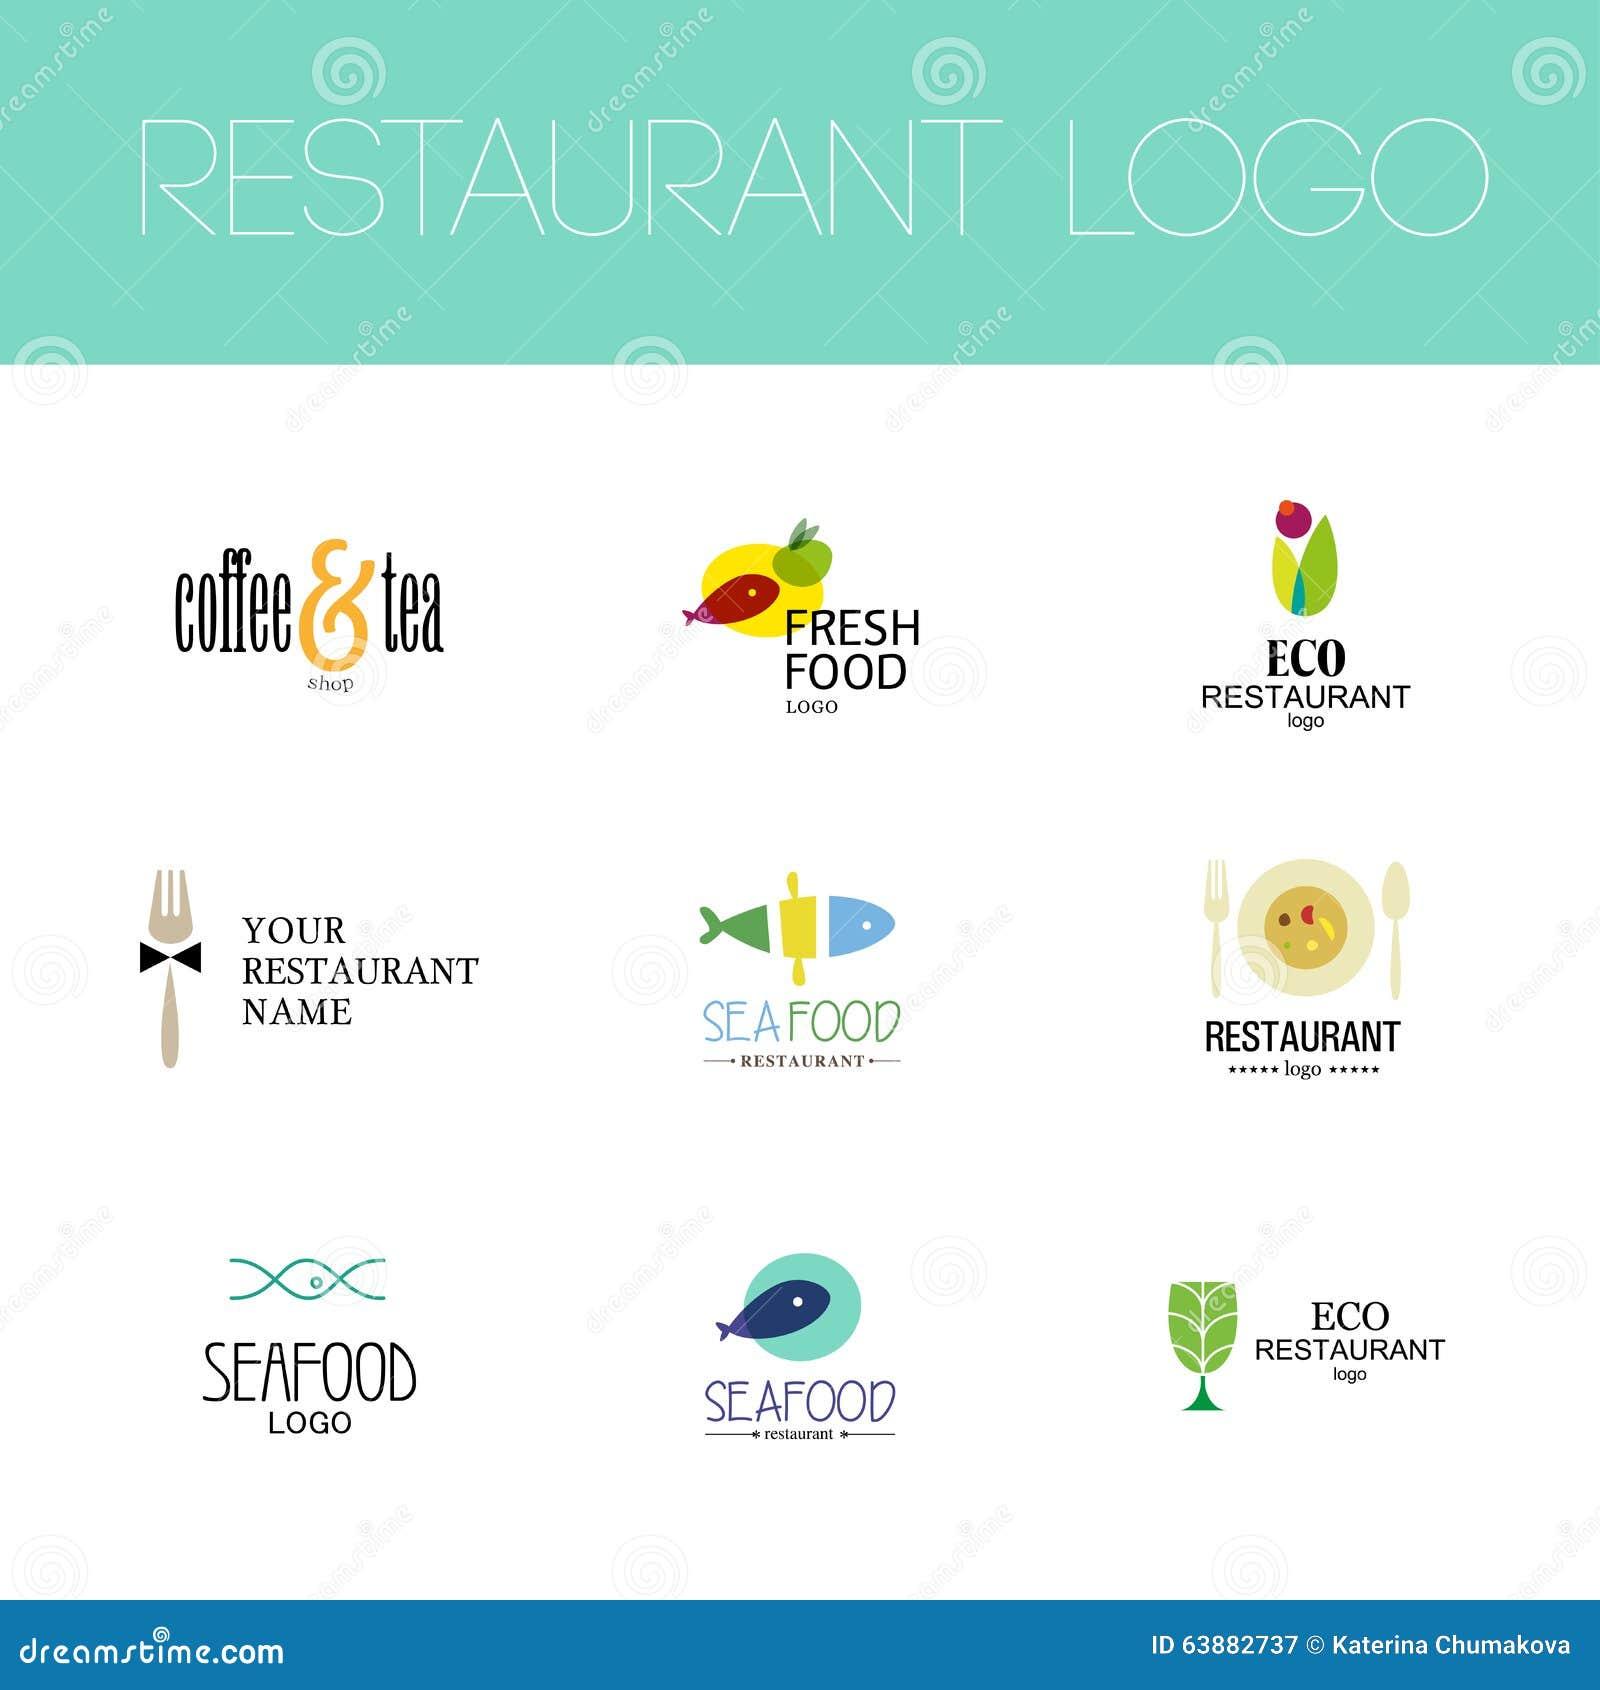 Restaurant Logo Free Vector Art  23928 Free Downloads